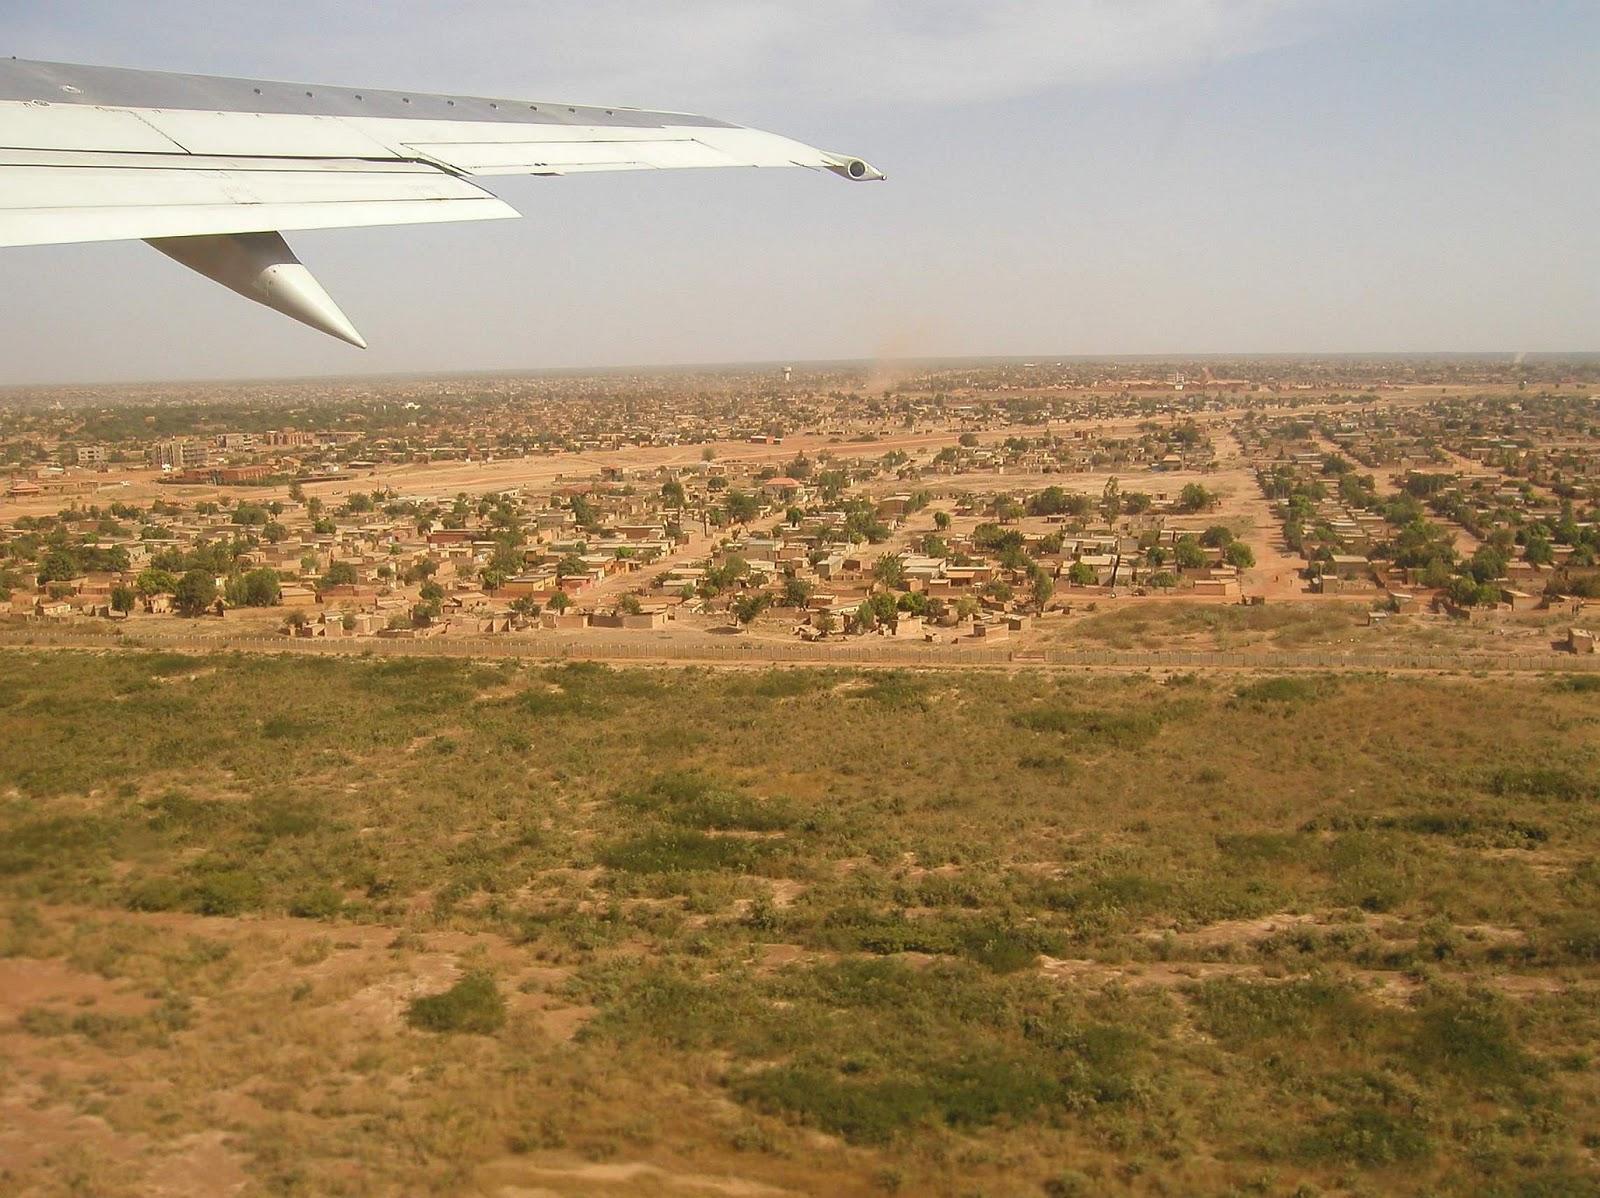 https://3.bp.blogspot.com/_e45GK4i1E8M/TQ9bfXs0FtI/AAAAAAAABmw/pU3tz0dX_TU/s1600/Burkina_Faso-Ouagadougou-PBtforcdivad.jpg